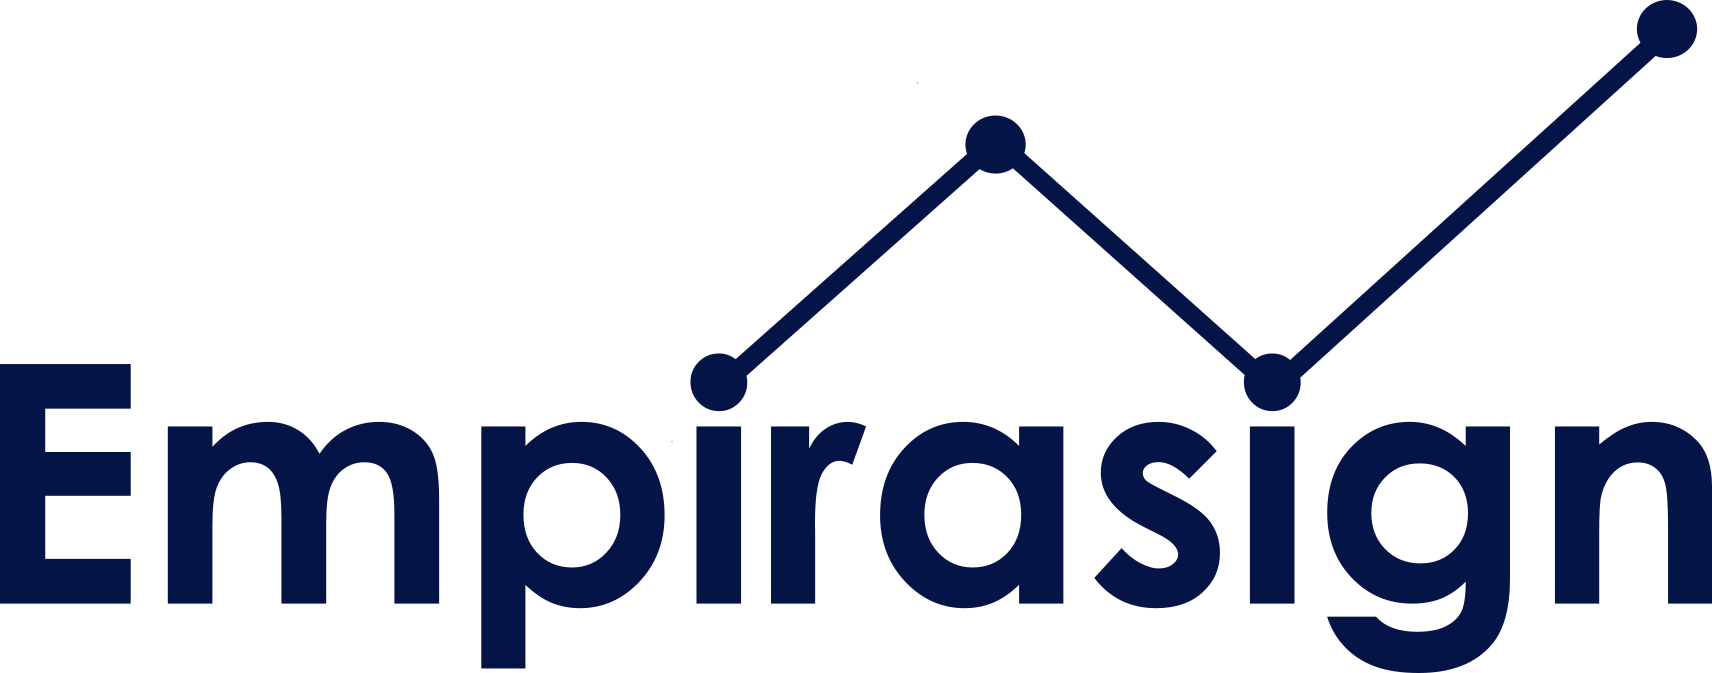 Online empirasign logo